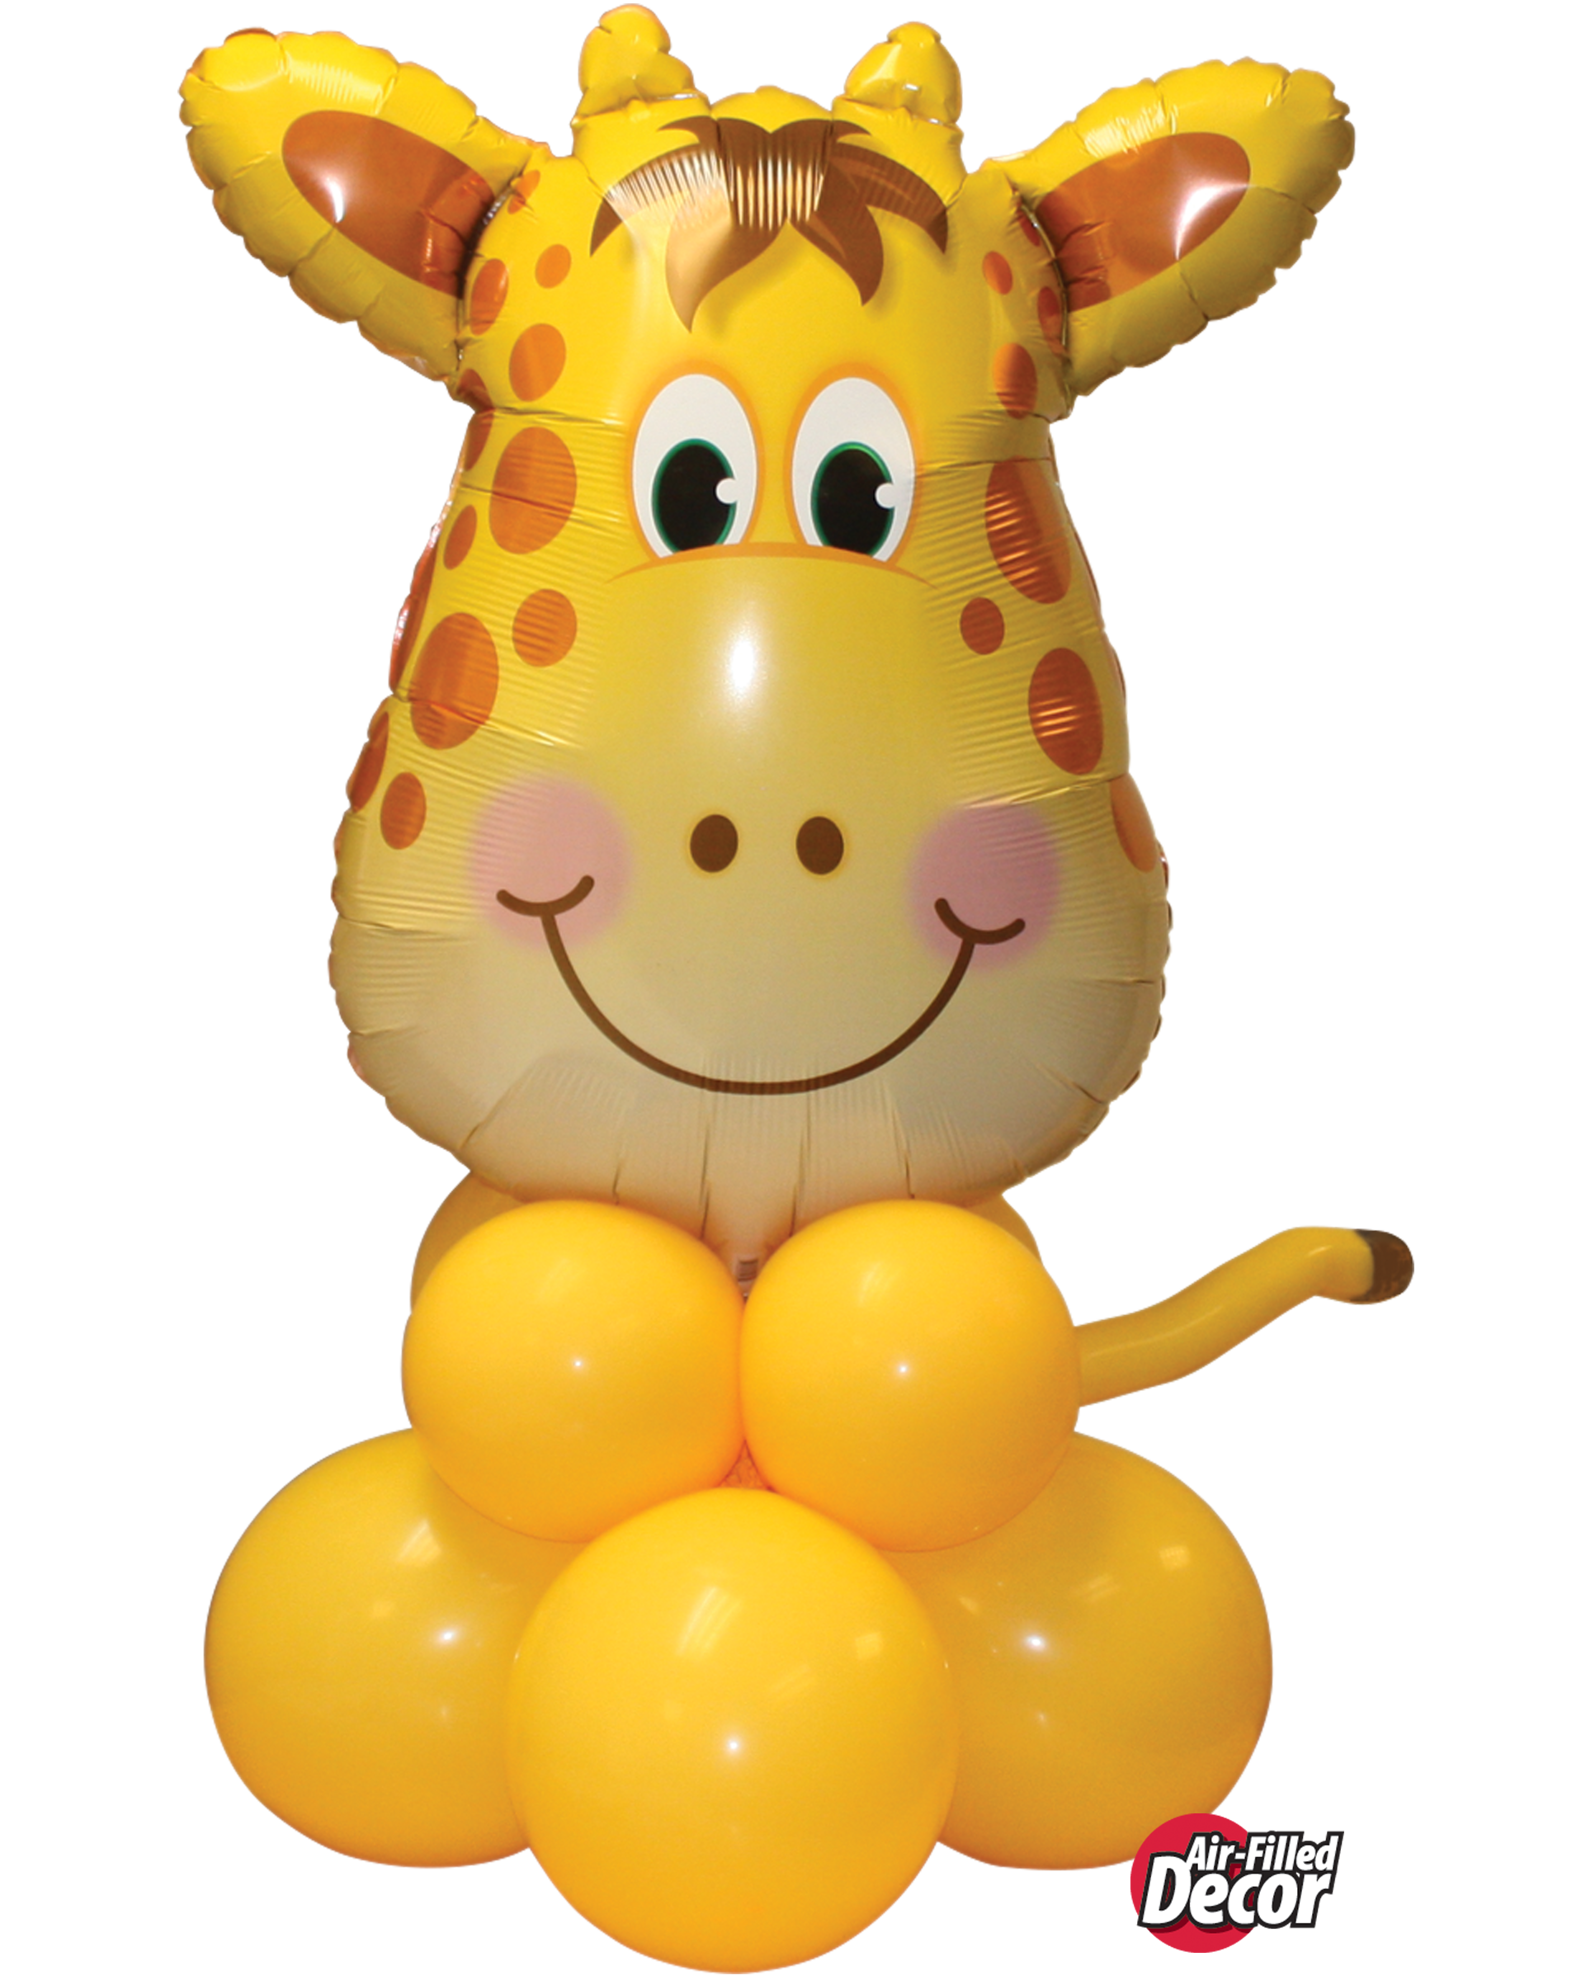 Picture of Jolly Giraffe Balloon Centerpiece